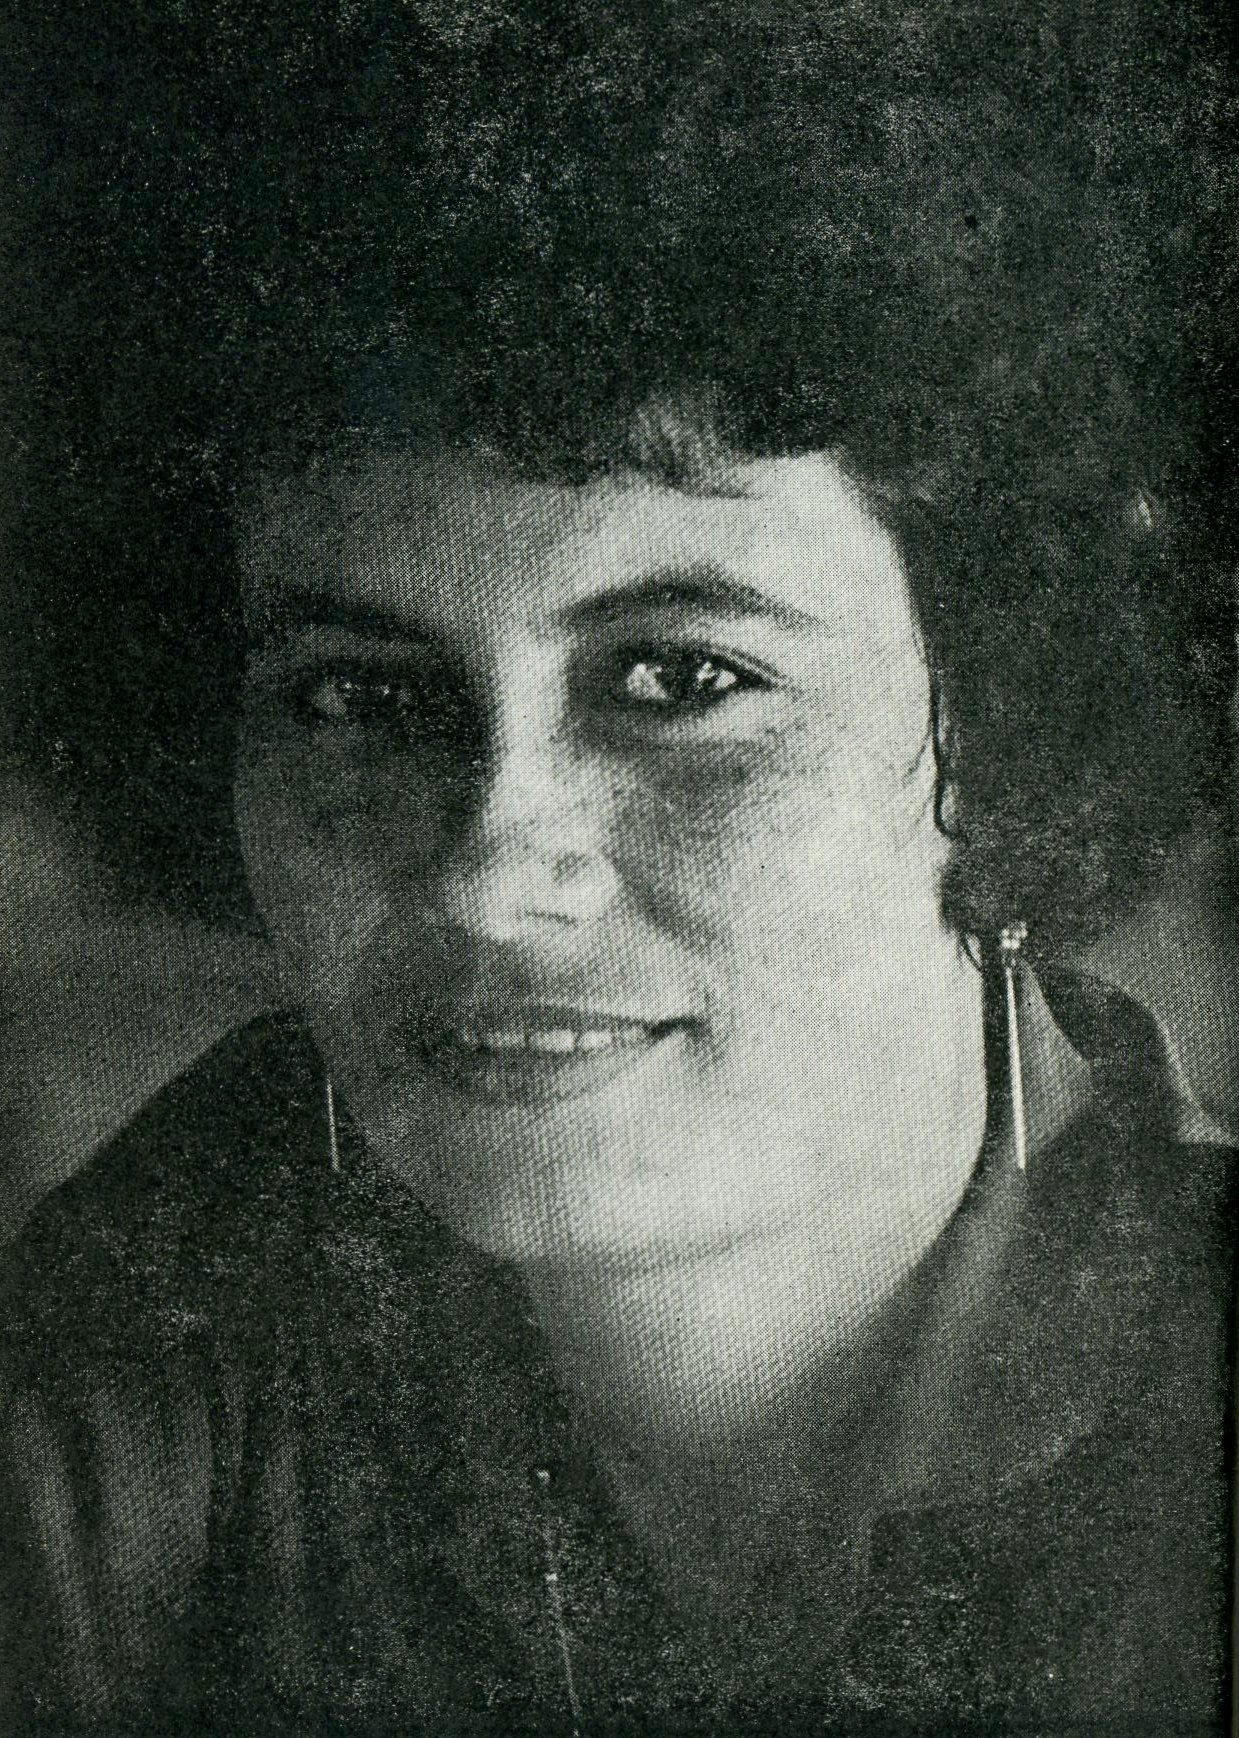 Liliane Nouh Chaia-Issa – Gré Ploeg (boerinnenkostuum, de moeder van Diana Dubois) – Tine Slager (kotomissie) - no7